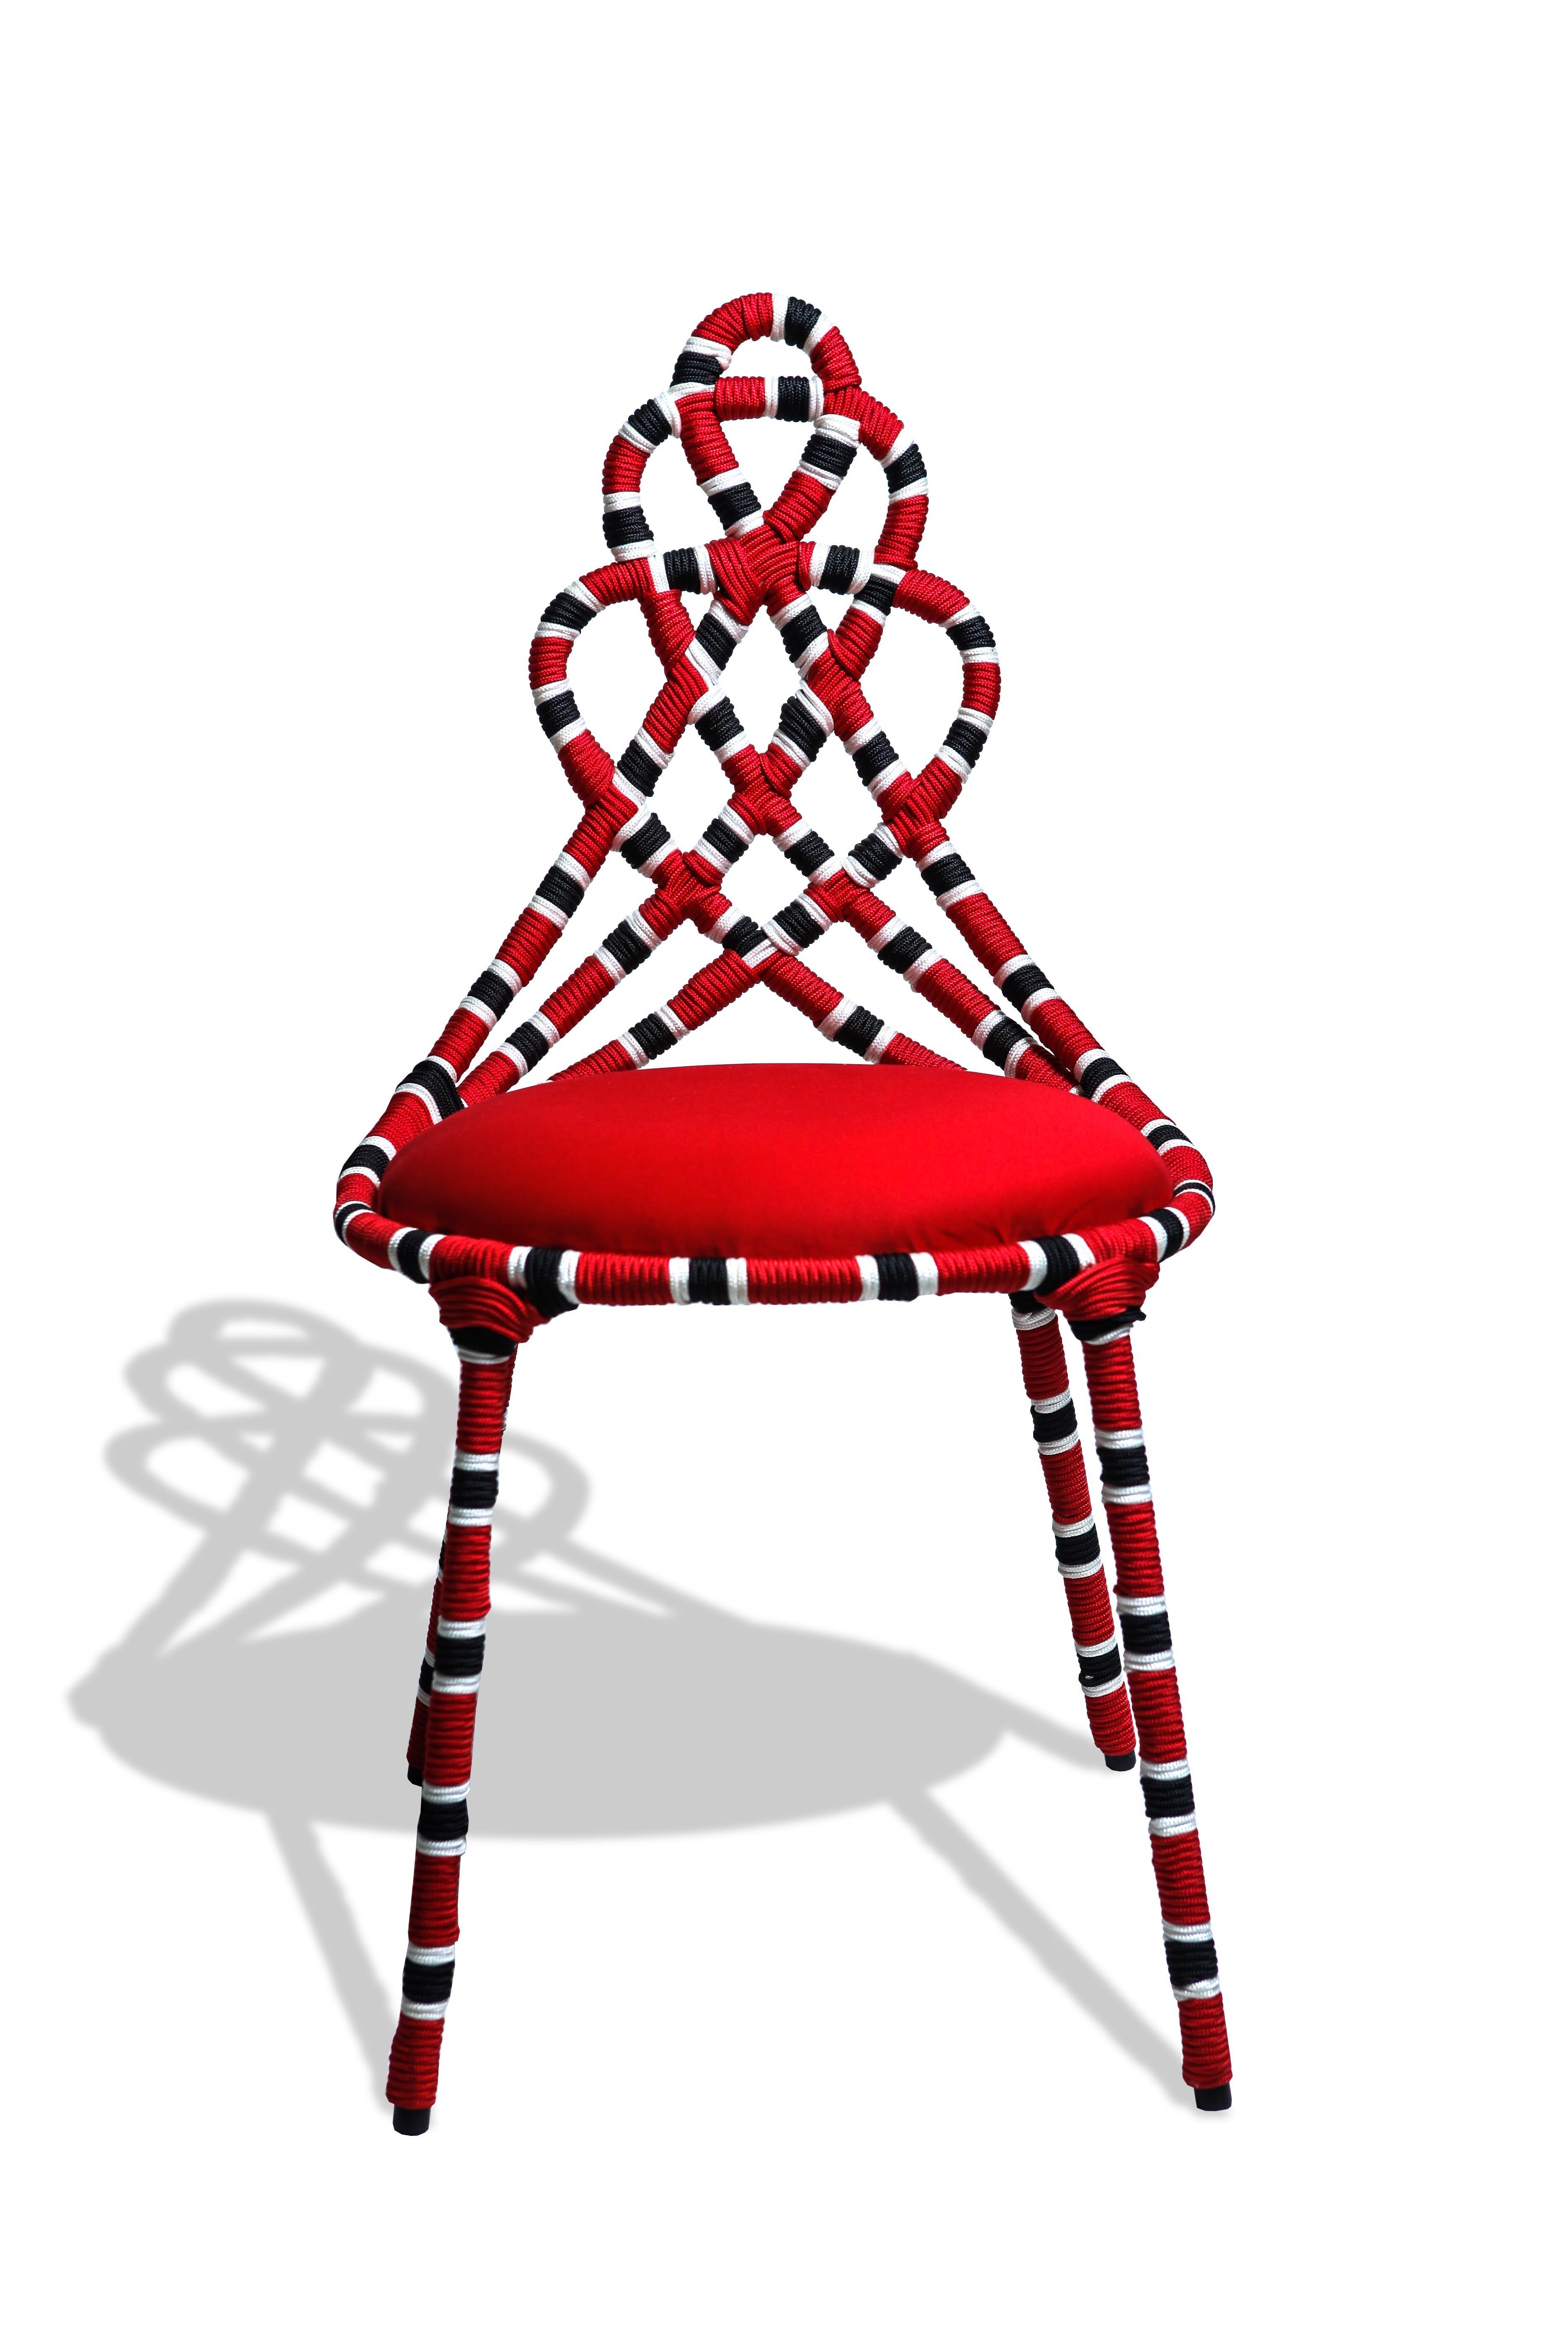 furniture p store online set shipped contemporary bedroom elenacontemporarybedroomset gucci elena